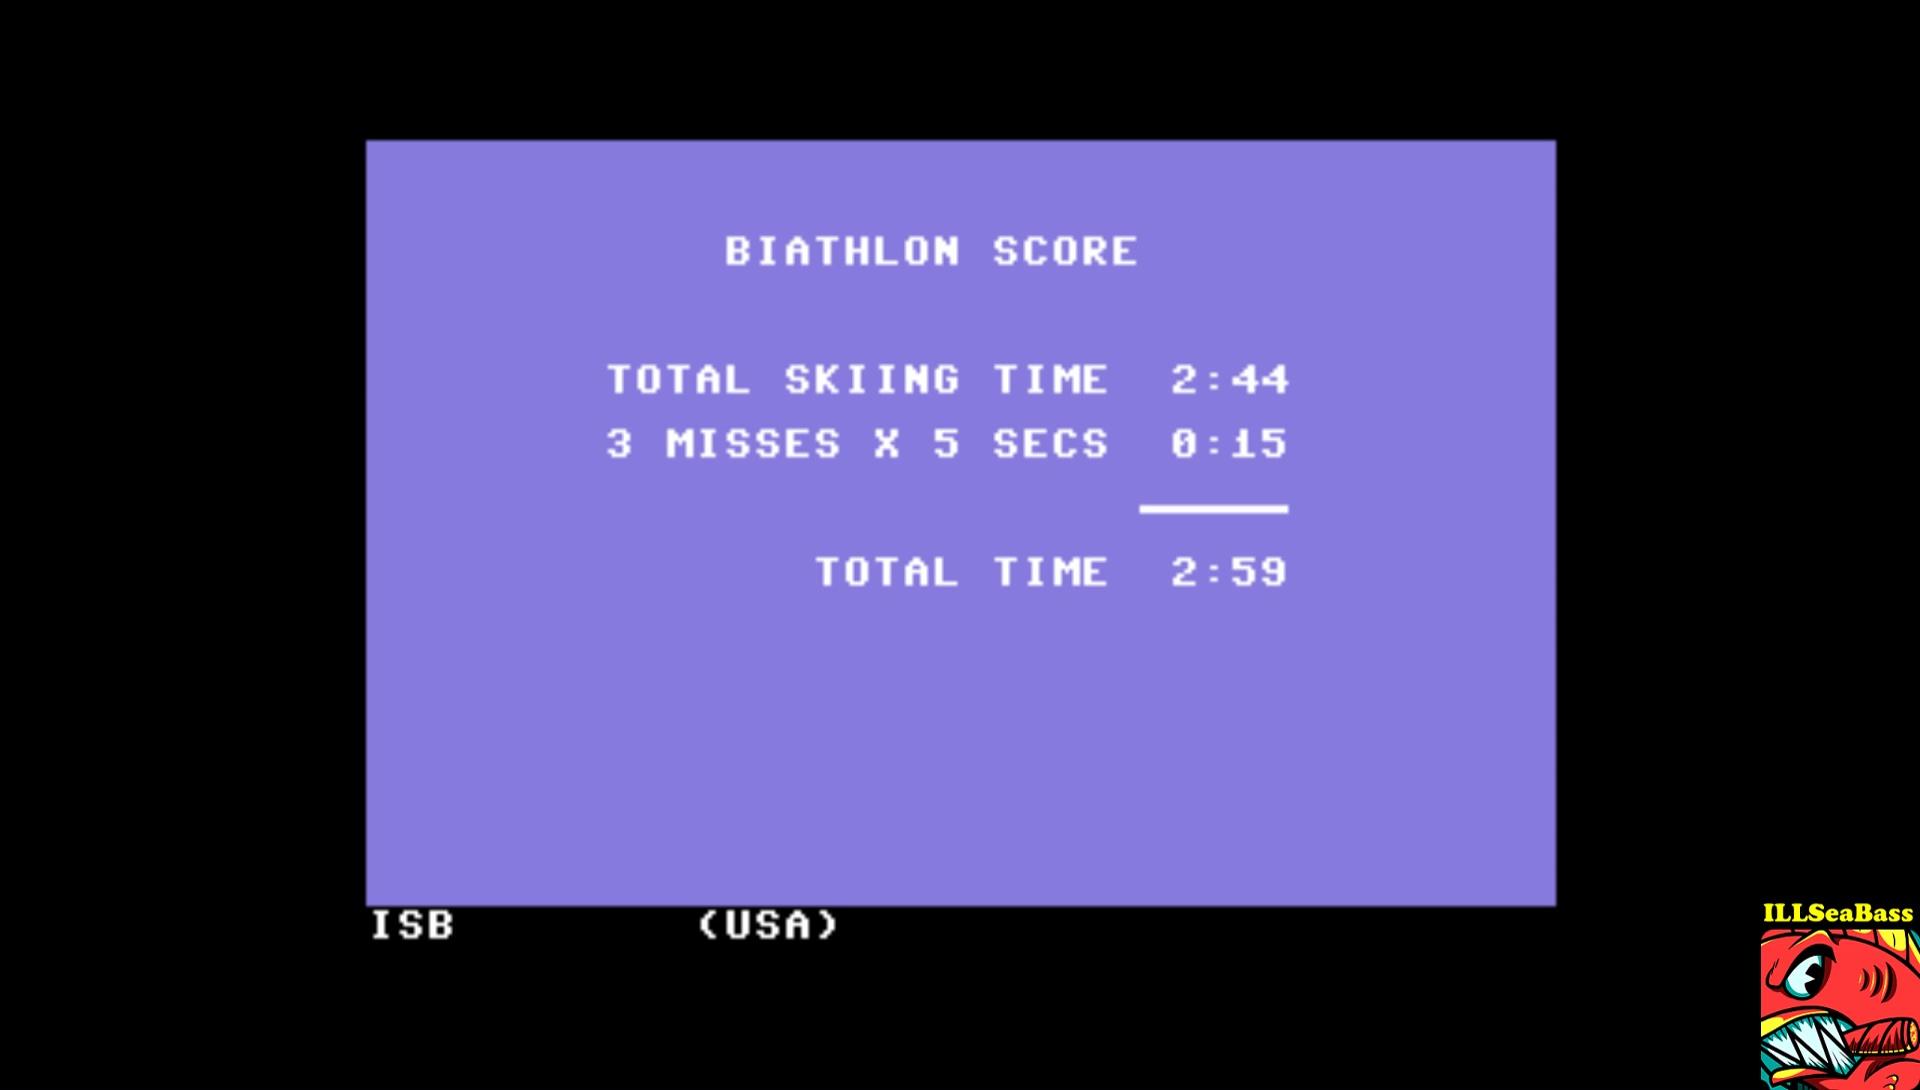 Winter Games: Biathlon time of 0:02:59